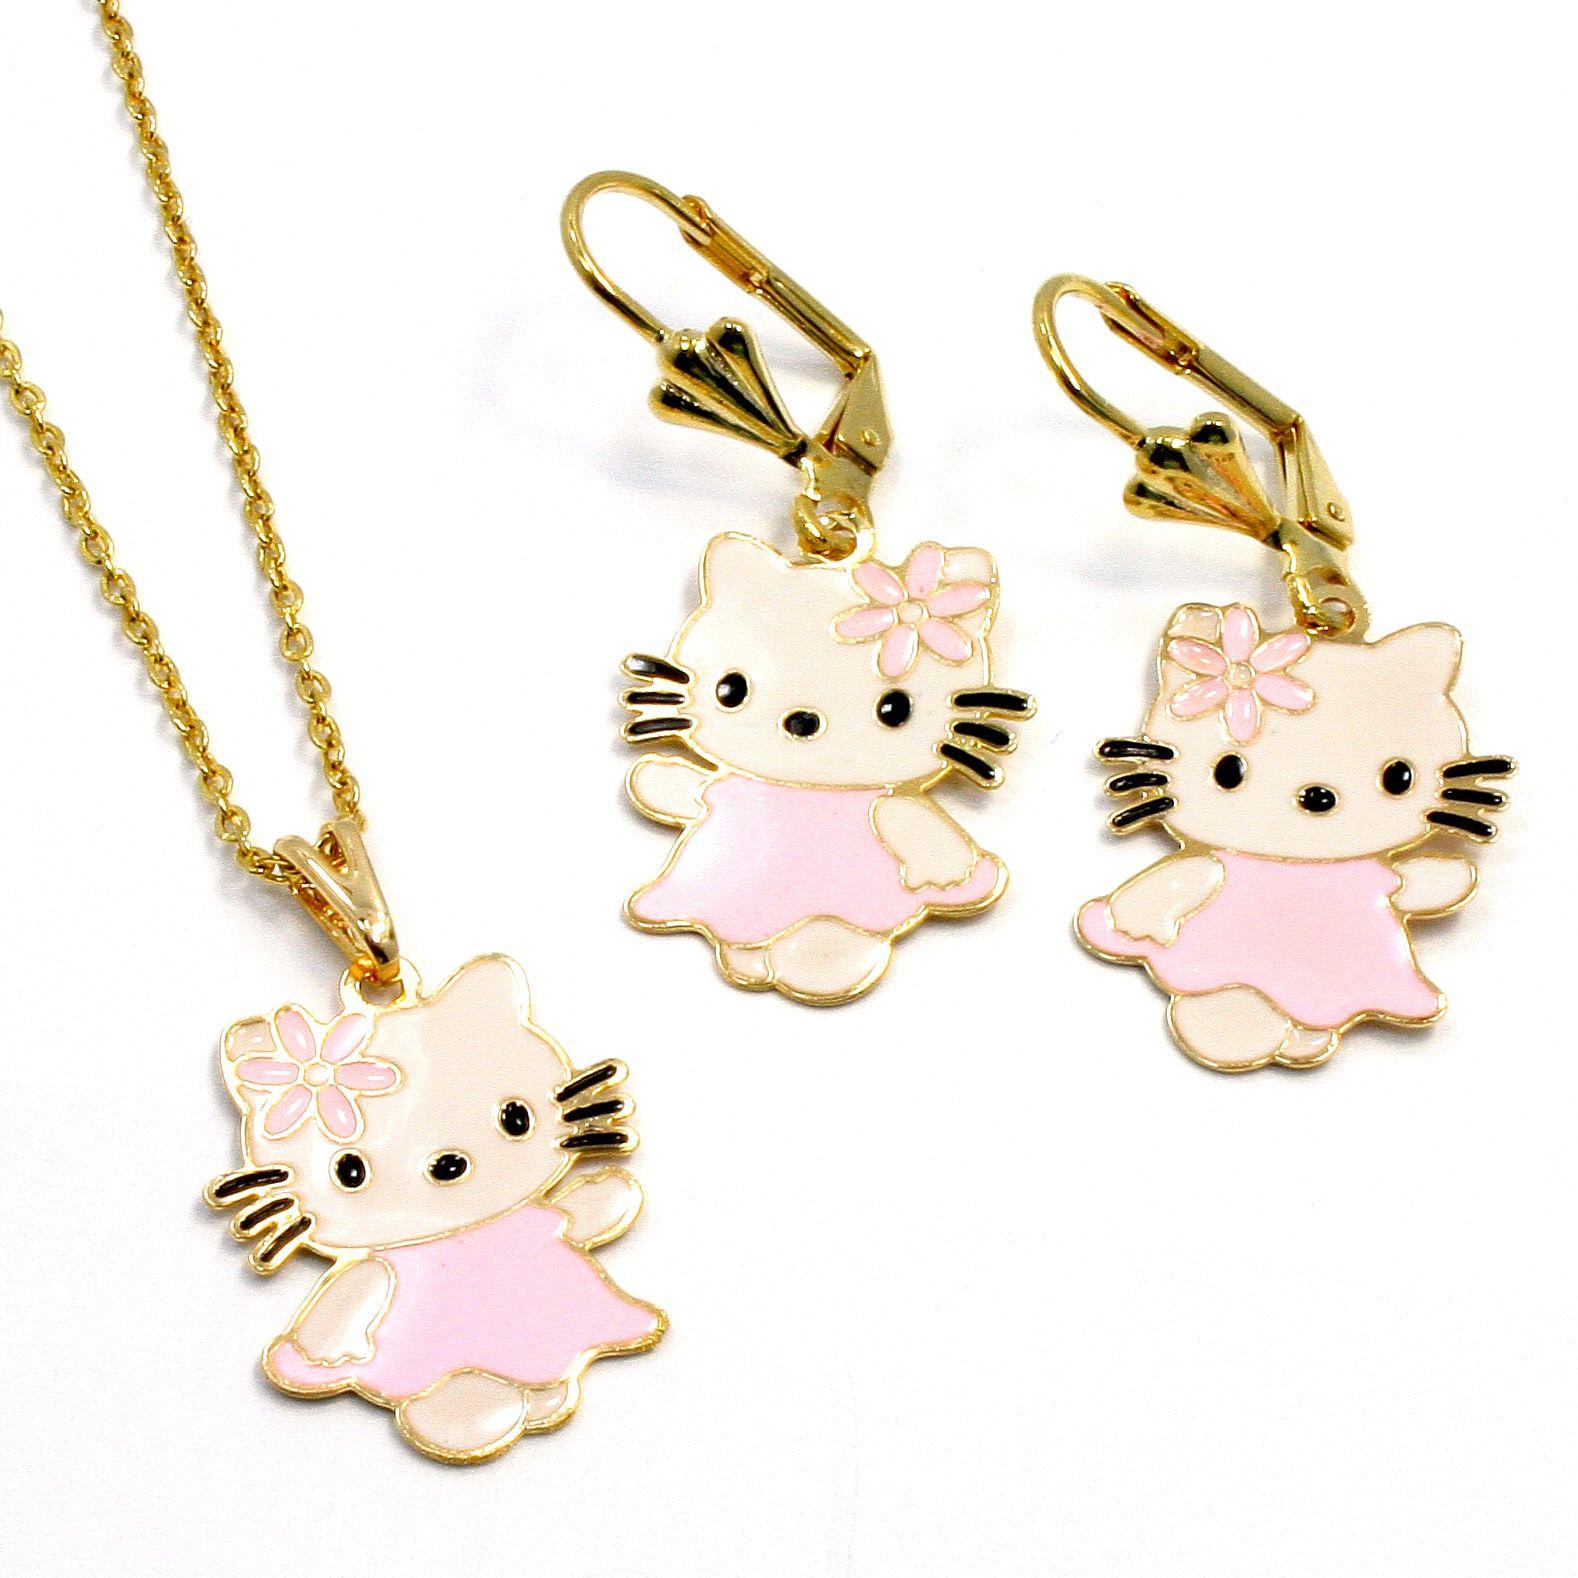 Gold 18K GF Pink Enamel Earrings Hello Kitty Girl Teens Pendant Charm